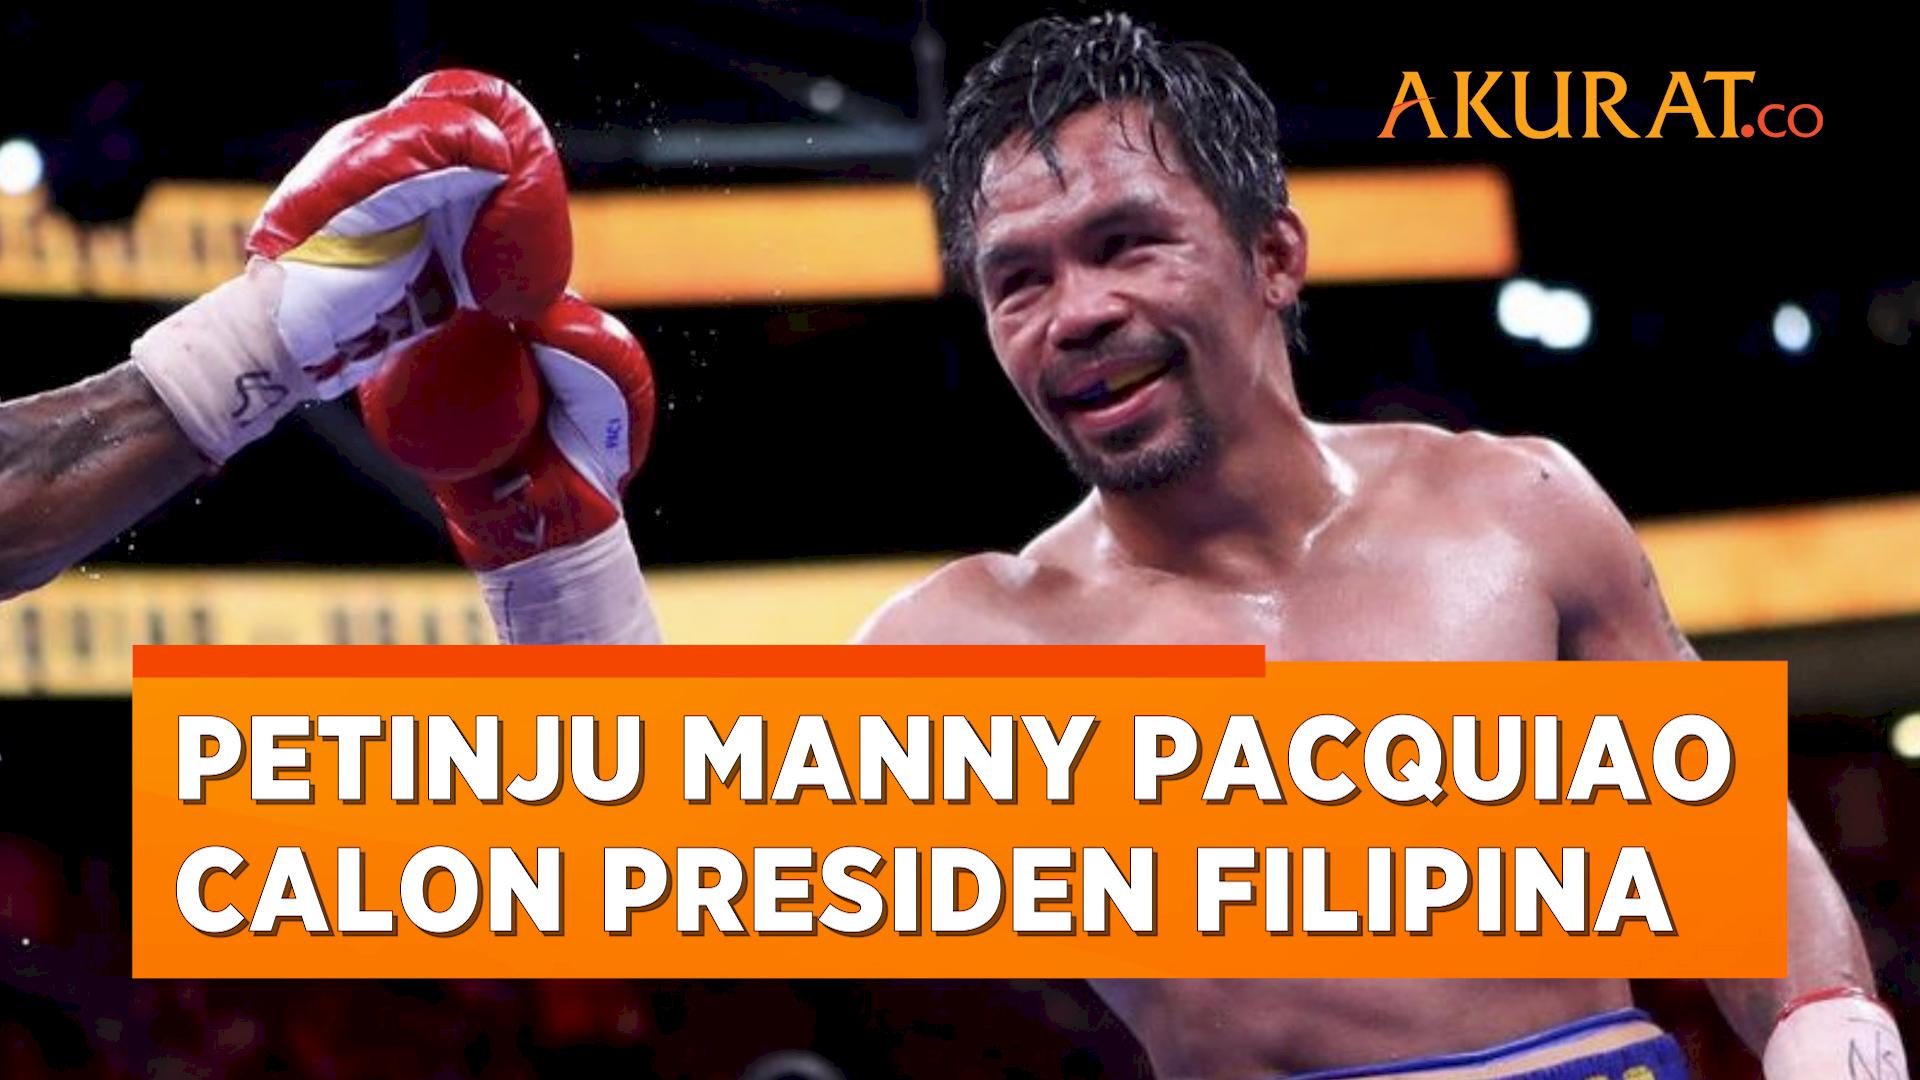 Petinju Legendaris Manny Pacquiao Maju Jadi Calon Presiden Filipina